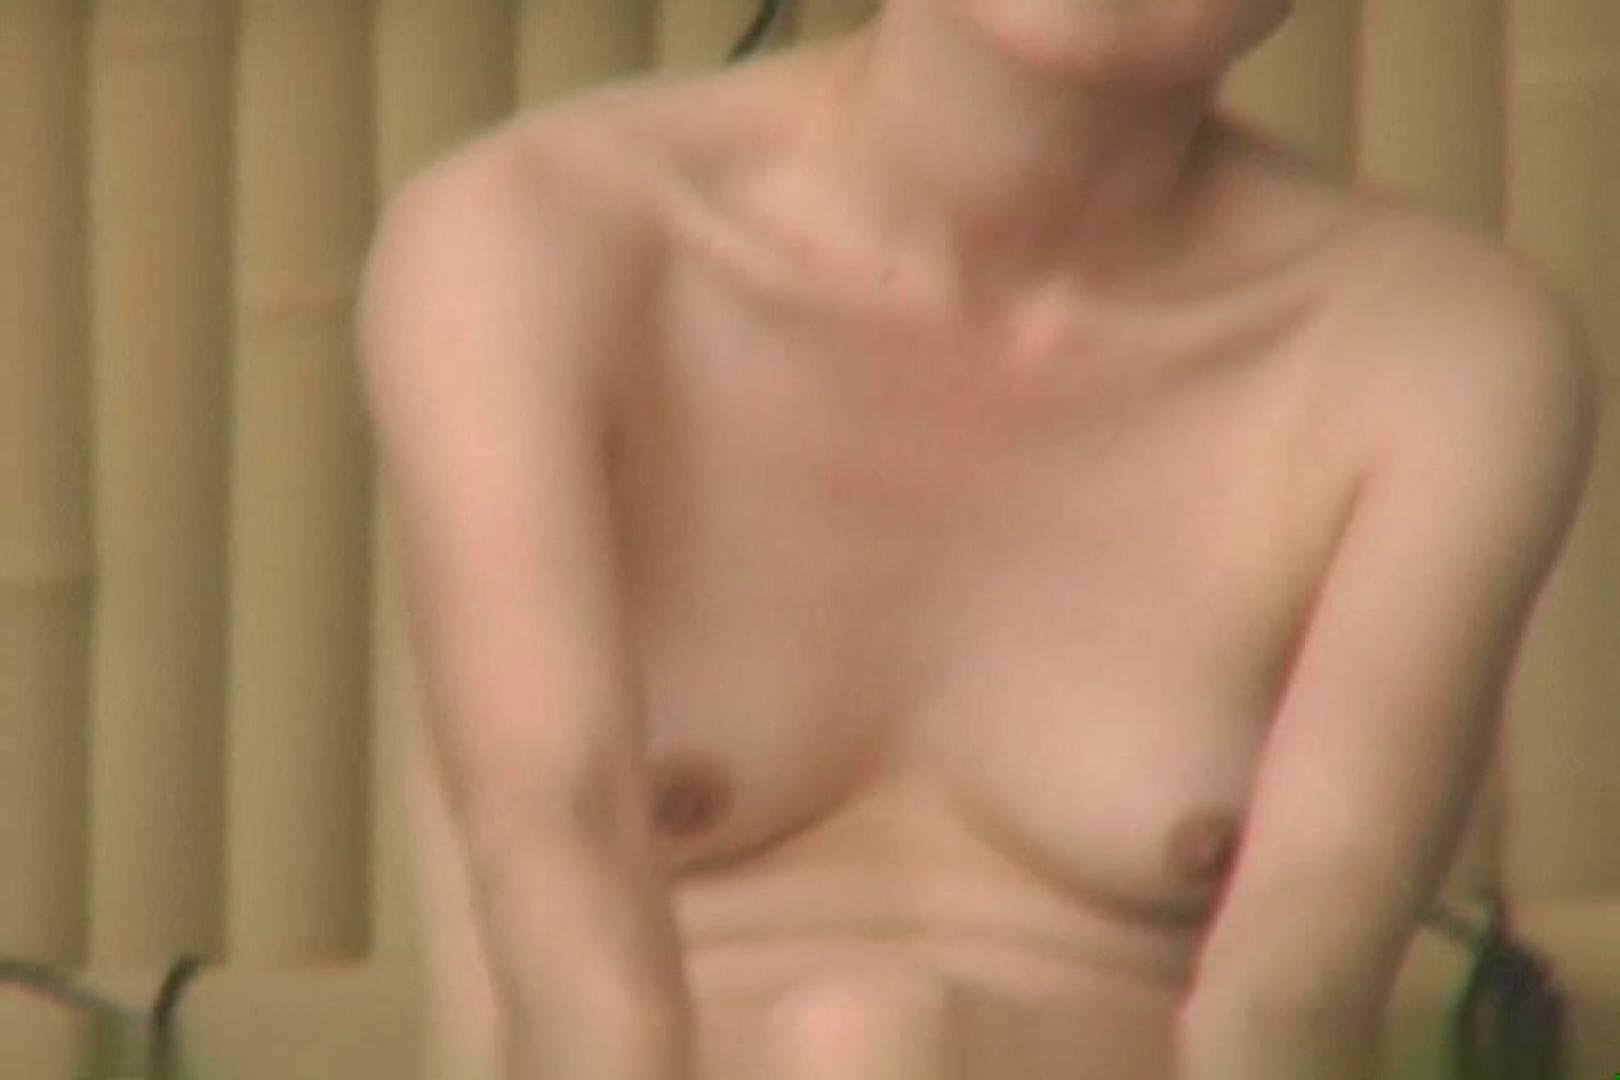 Aquaな露天風呂Vol.578 OL女体 われめAV動画紹介 77連発 77